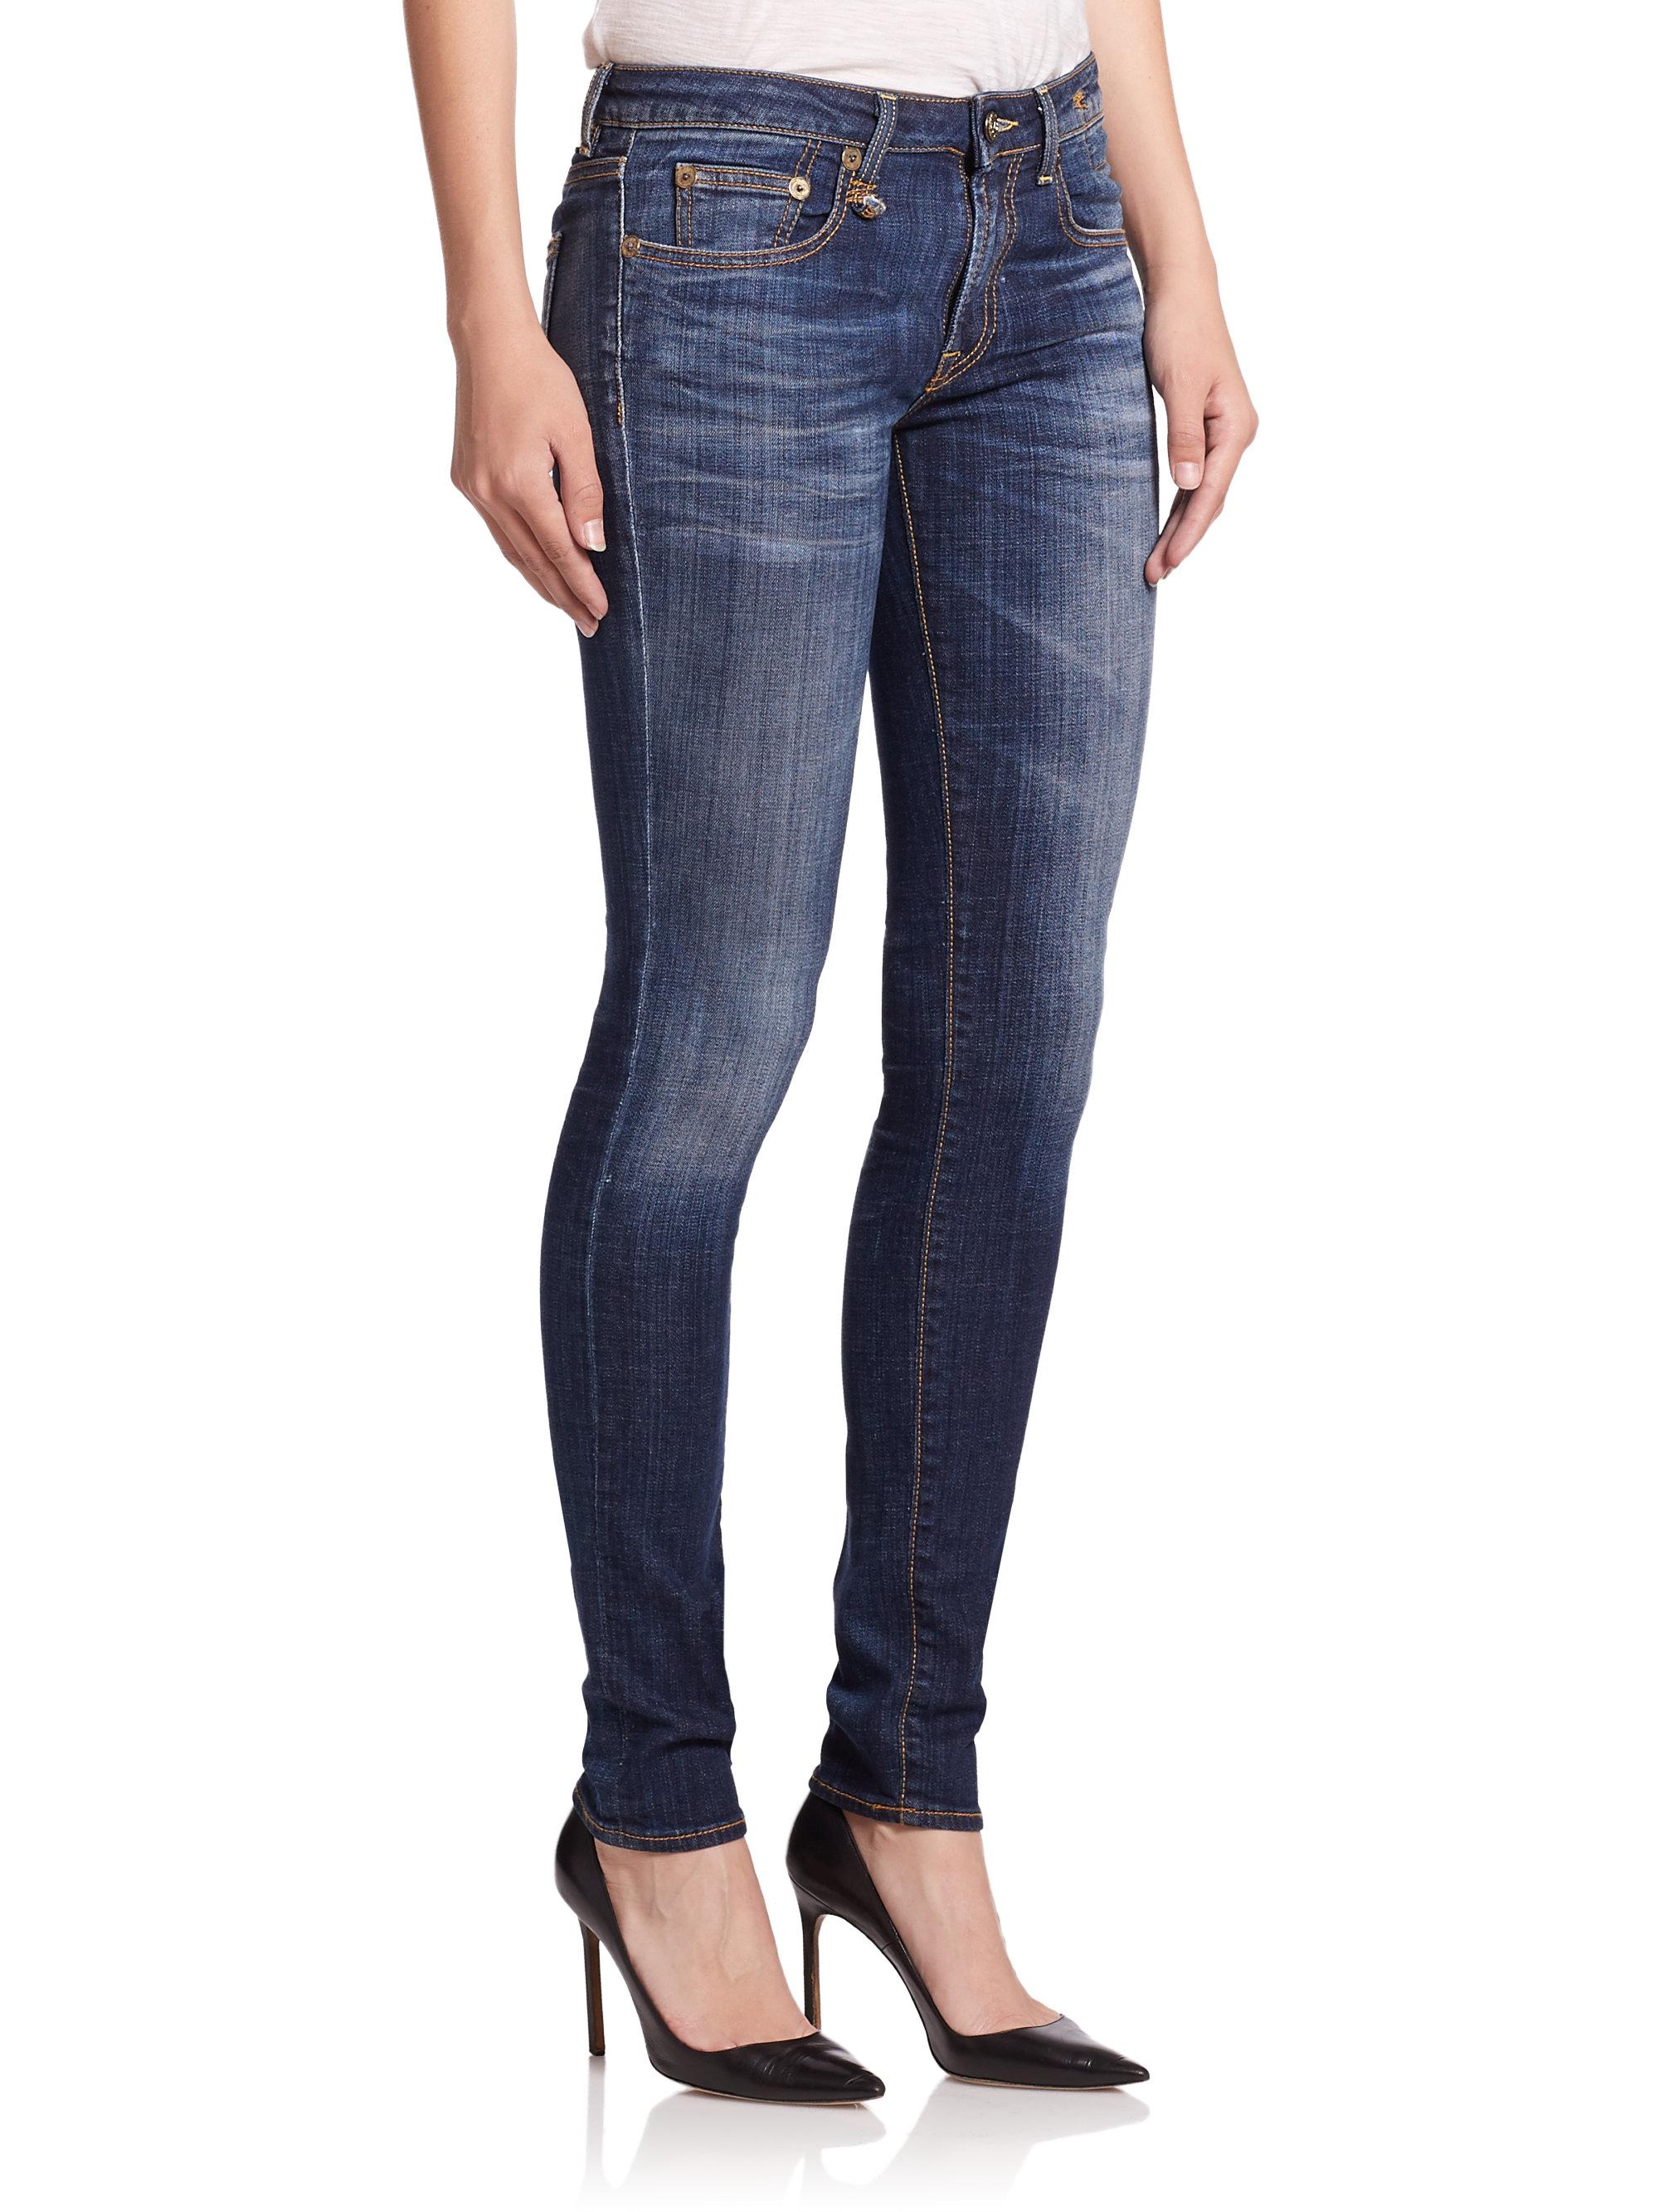 Womens Alison Skinny Jeans R13 vxo93